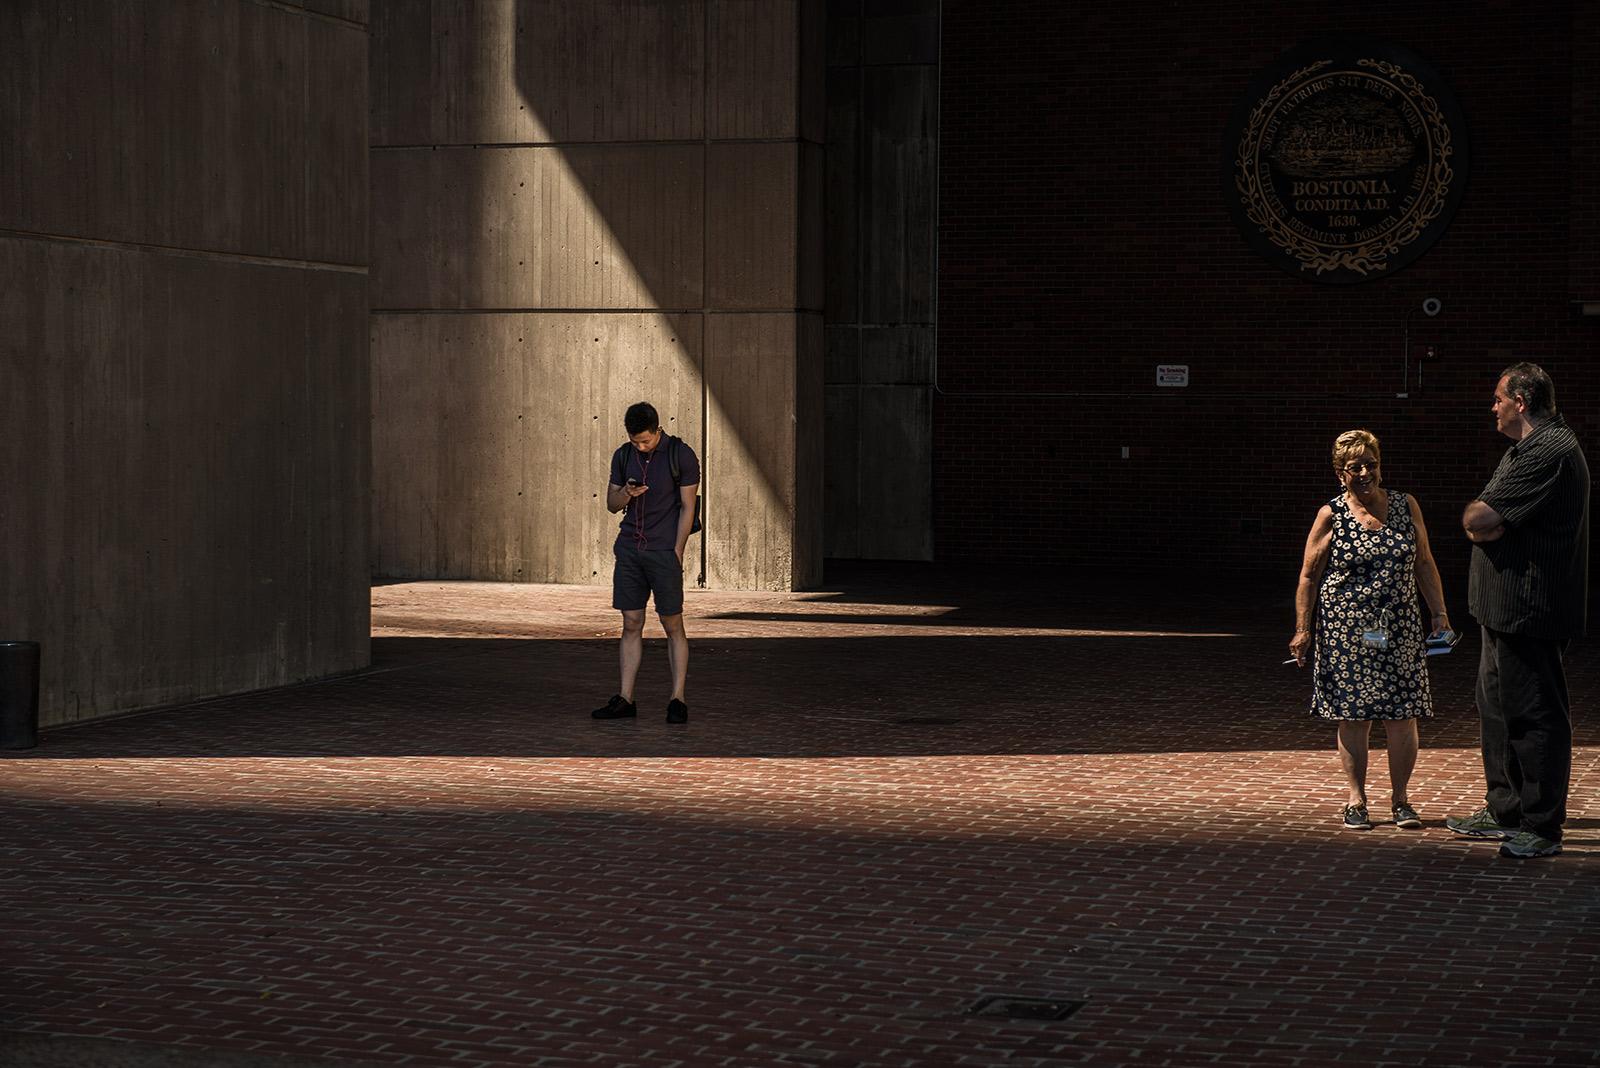 Boston_01